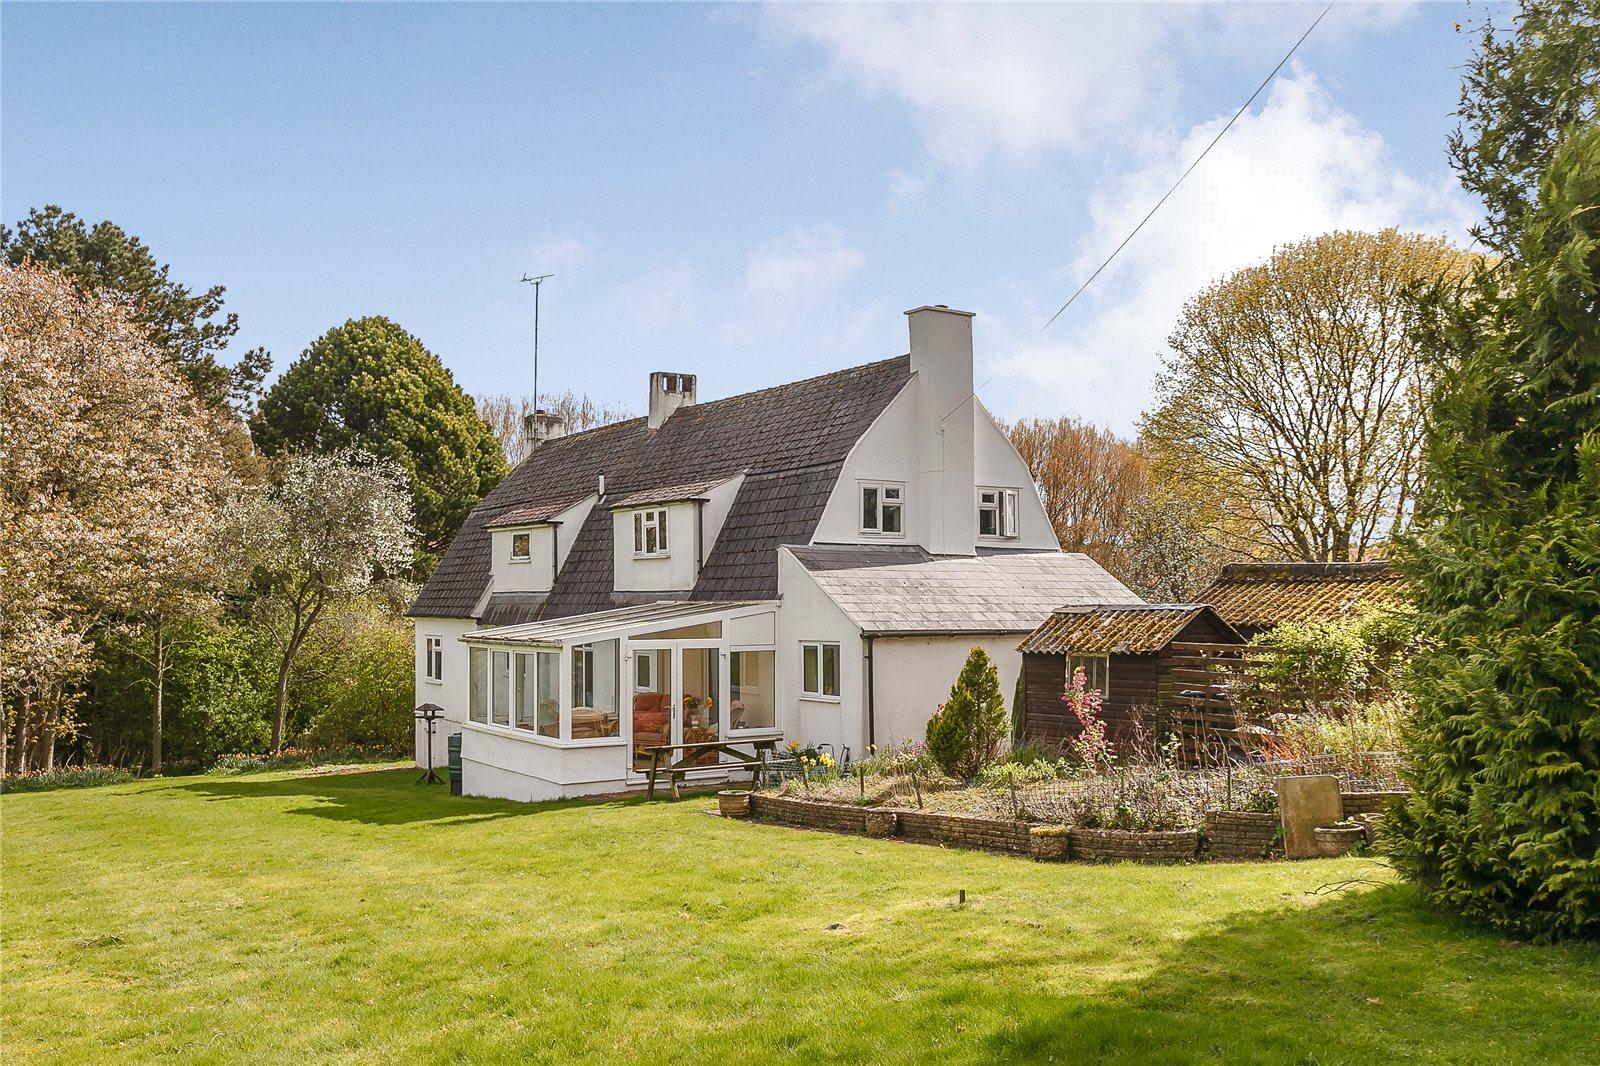 Maison unifamiliale pour l Vente à Perrotts Brook, Cirencester, Gloucestershire, GL7 Cirencester, Angleterre